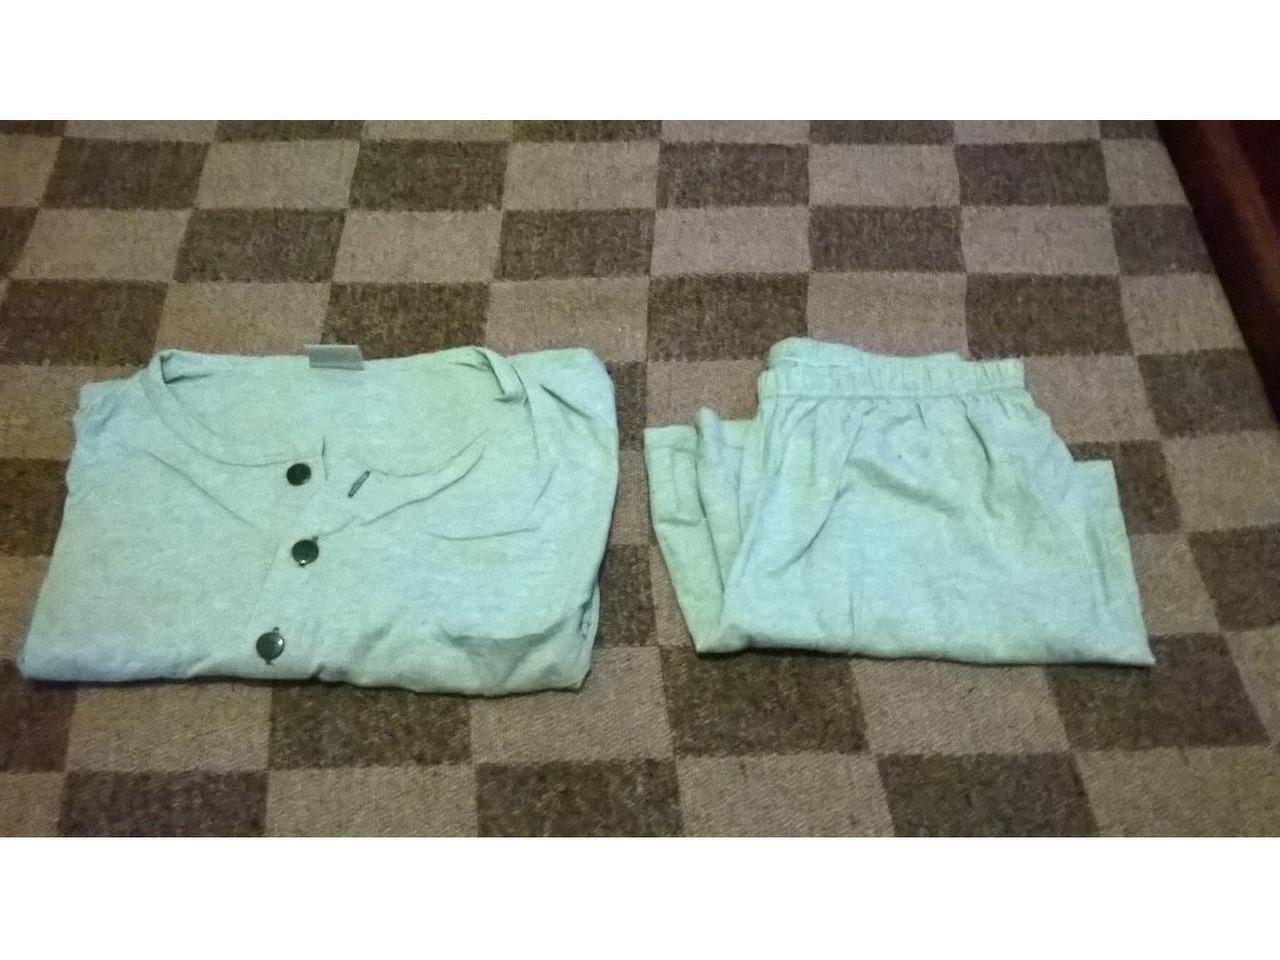 Pijamas (segunda mão) - 10/12